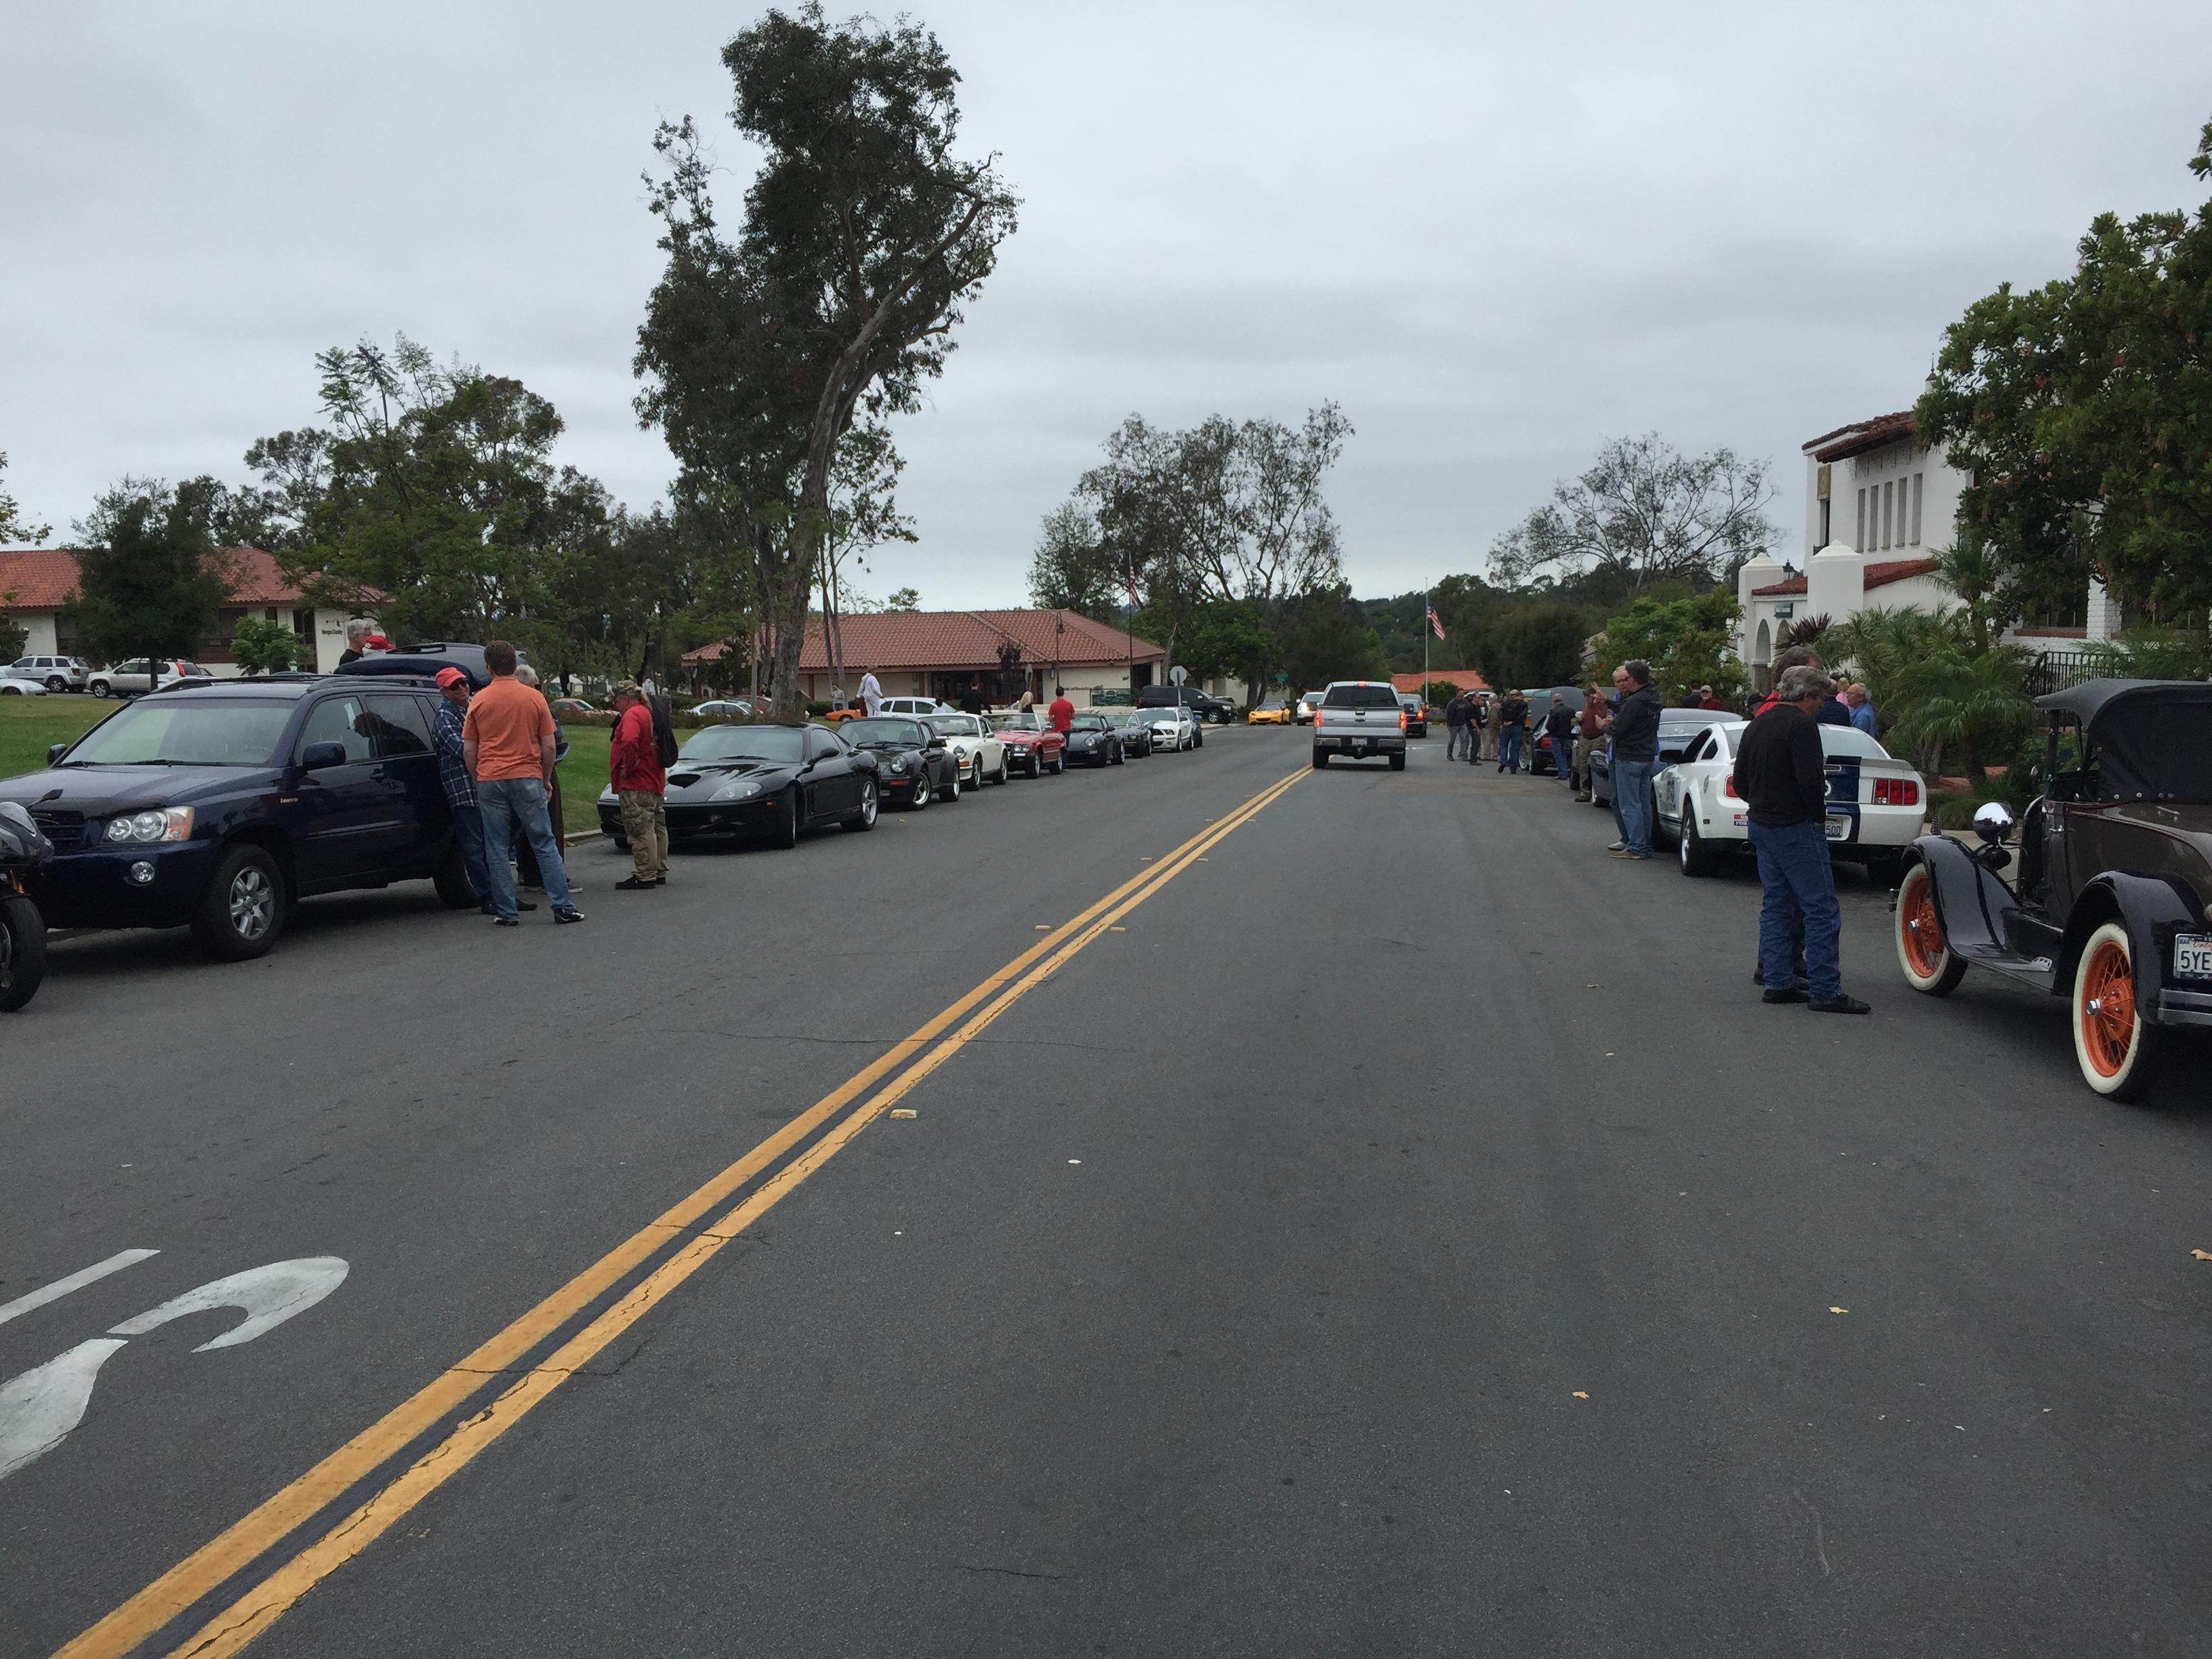 California Dreamin The Car Culture of SoCal